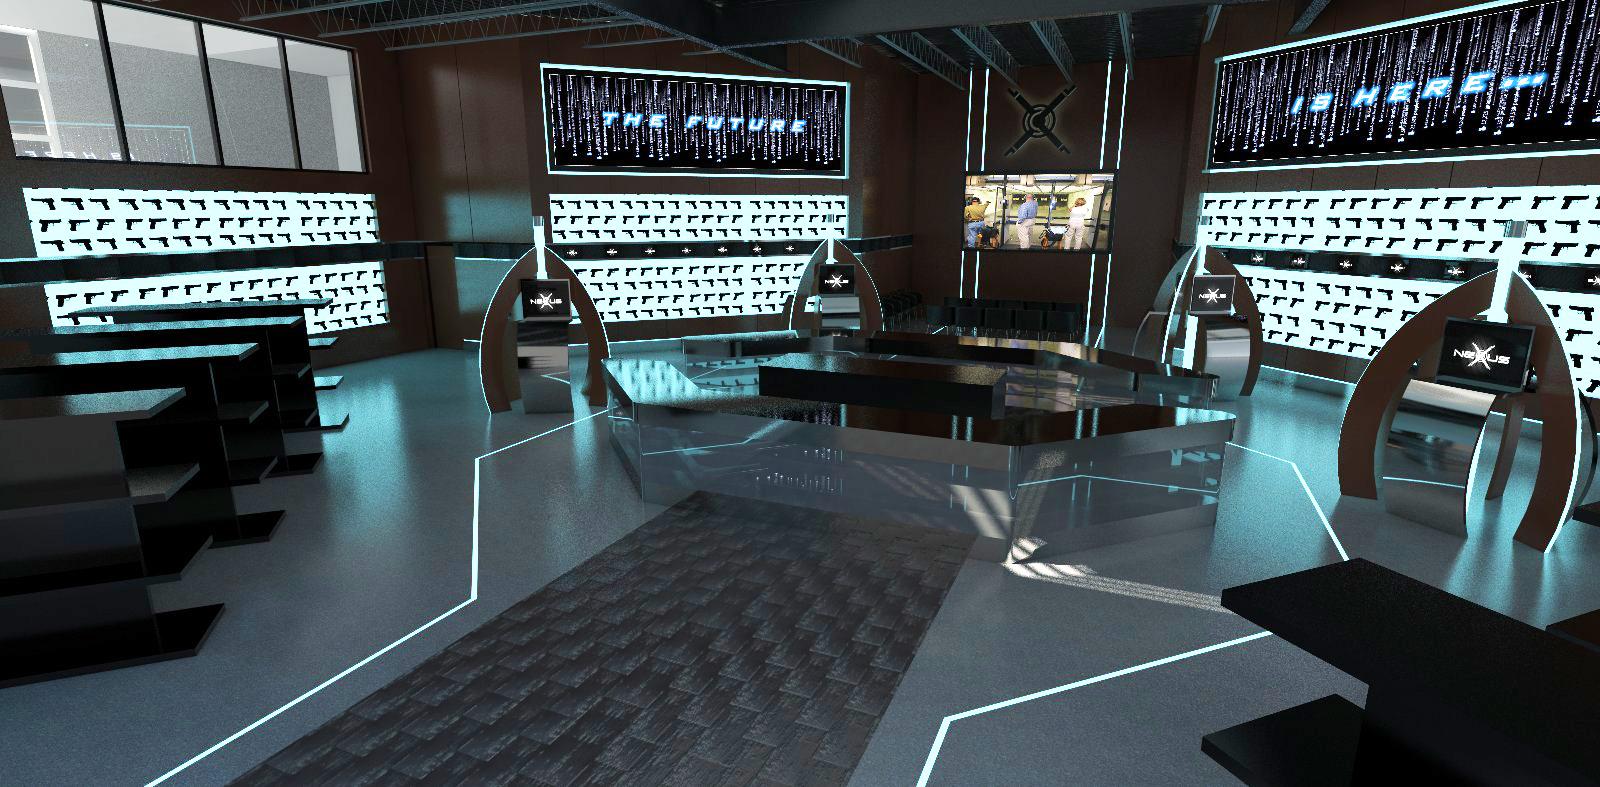 Nexus Shooting Refined Renderings of the Retail Space Interior Design